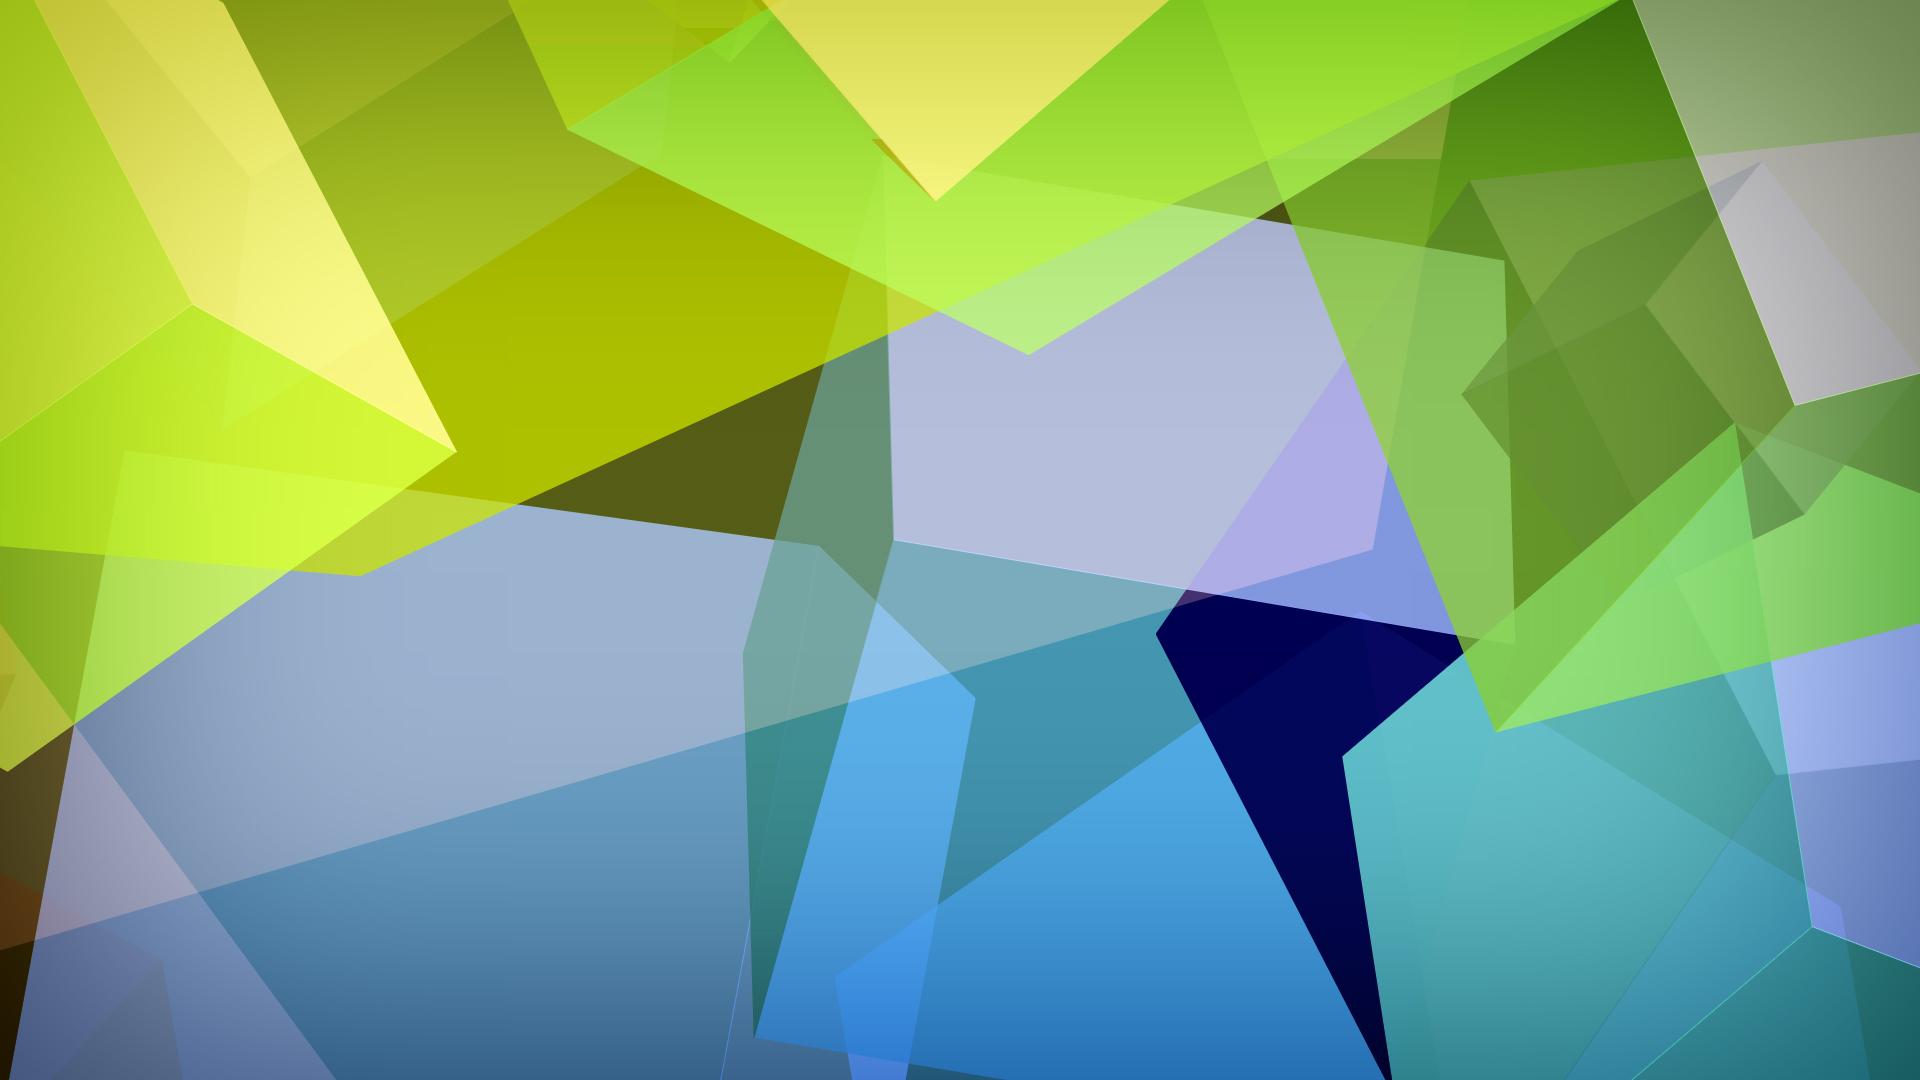 geometric shape wallpaper 2015   Grasscloth Wallpaper 1920x1080